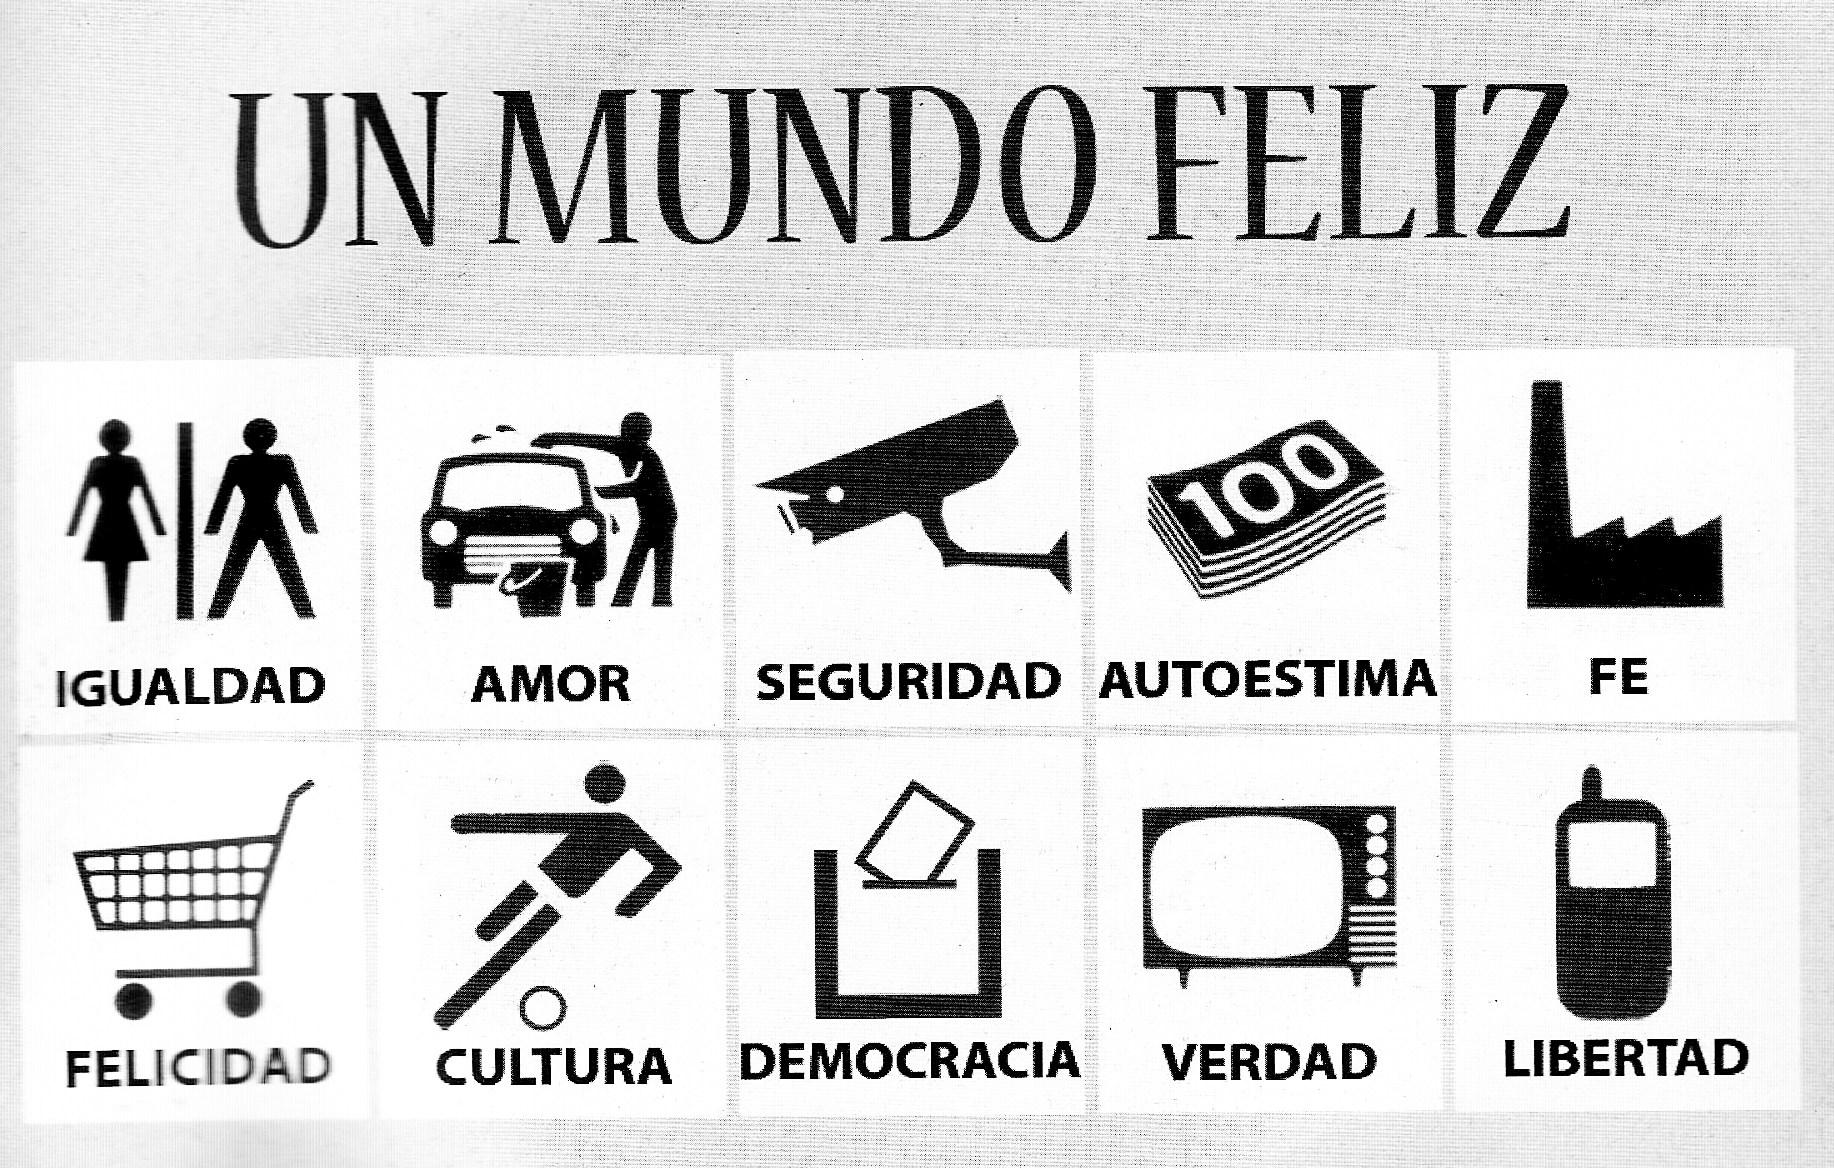 https://i0.wp.com/argentina.indymedia.org/uploads/2010/06/un_mundo_feliz.jpeg